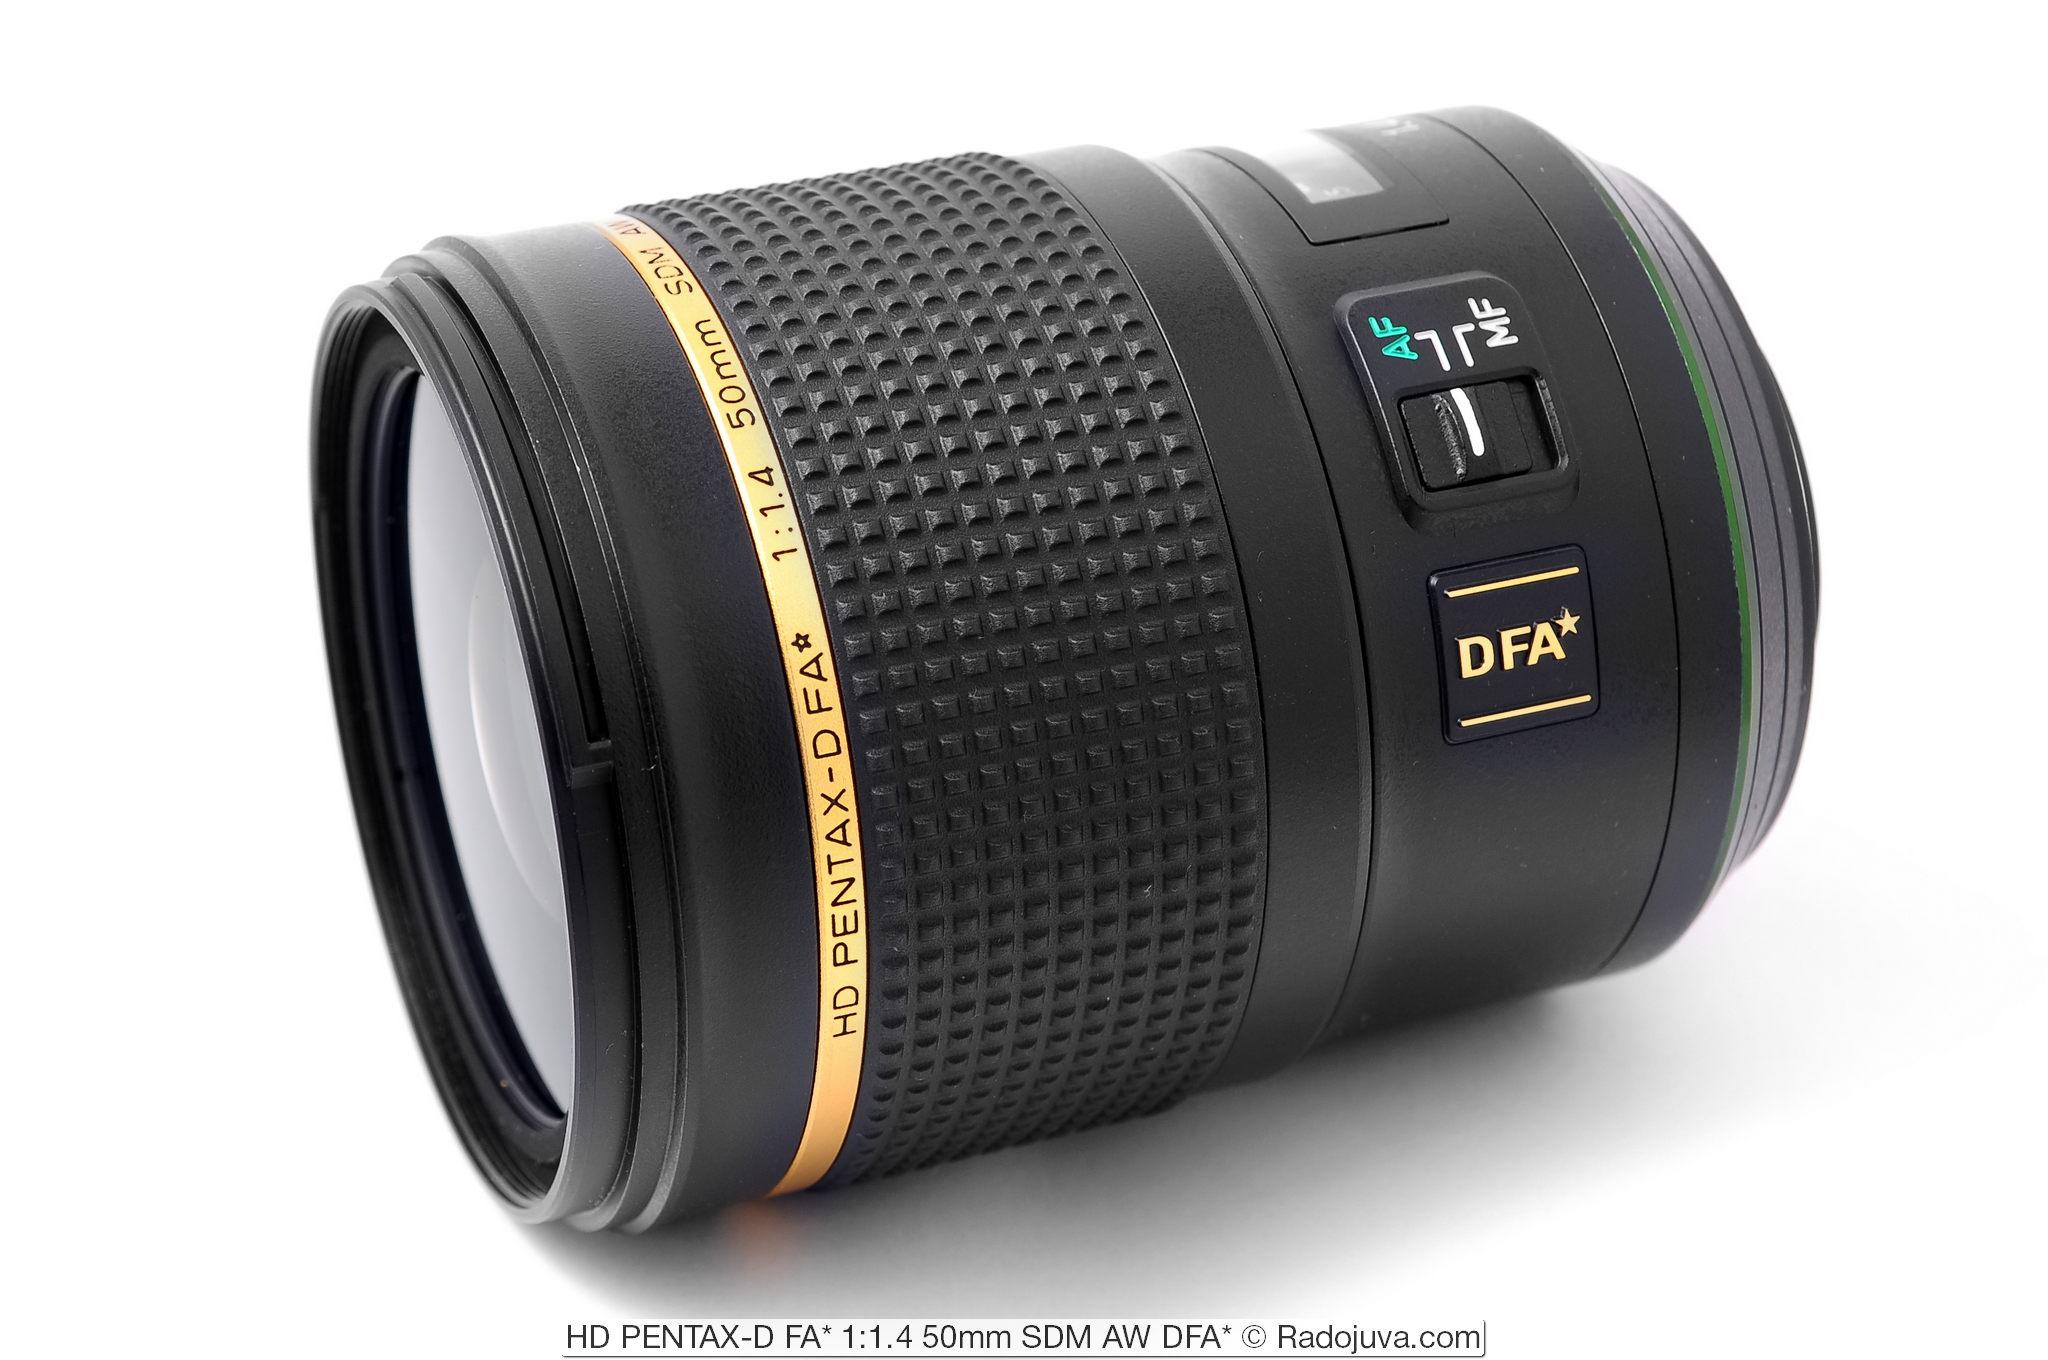 HD PENTAX-D FA* 1:1.4 50mm SDM AW DFA*